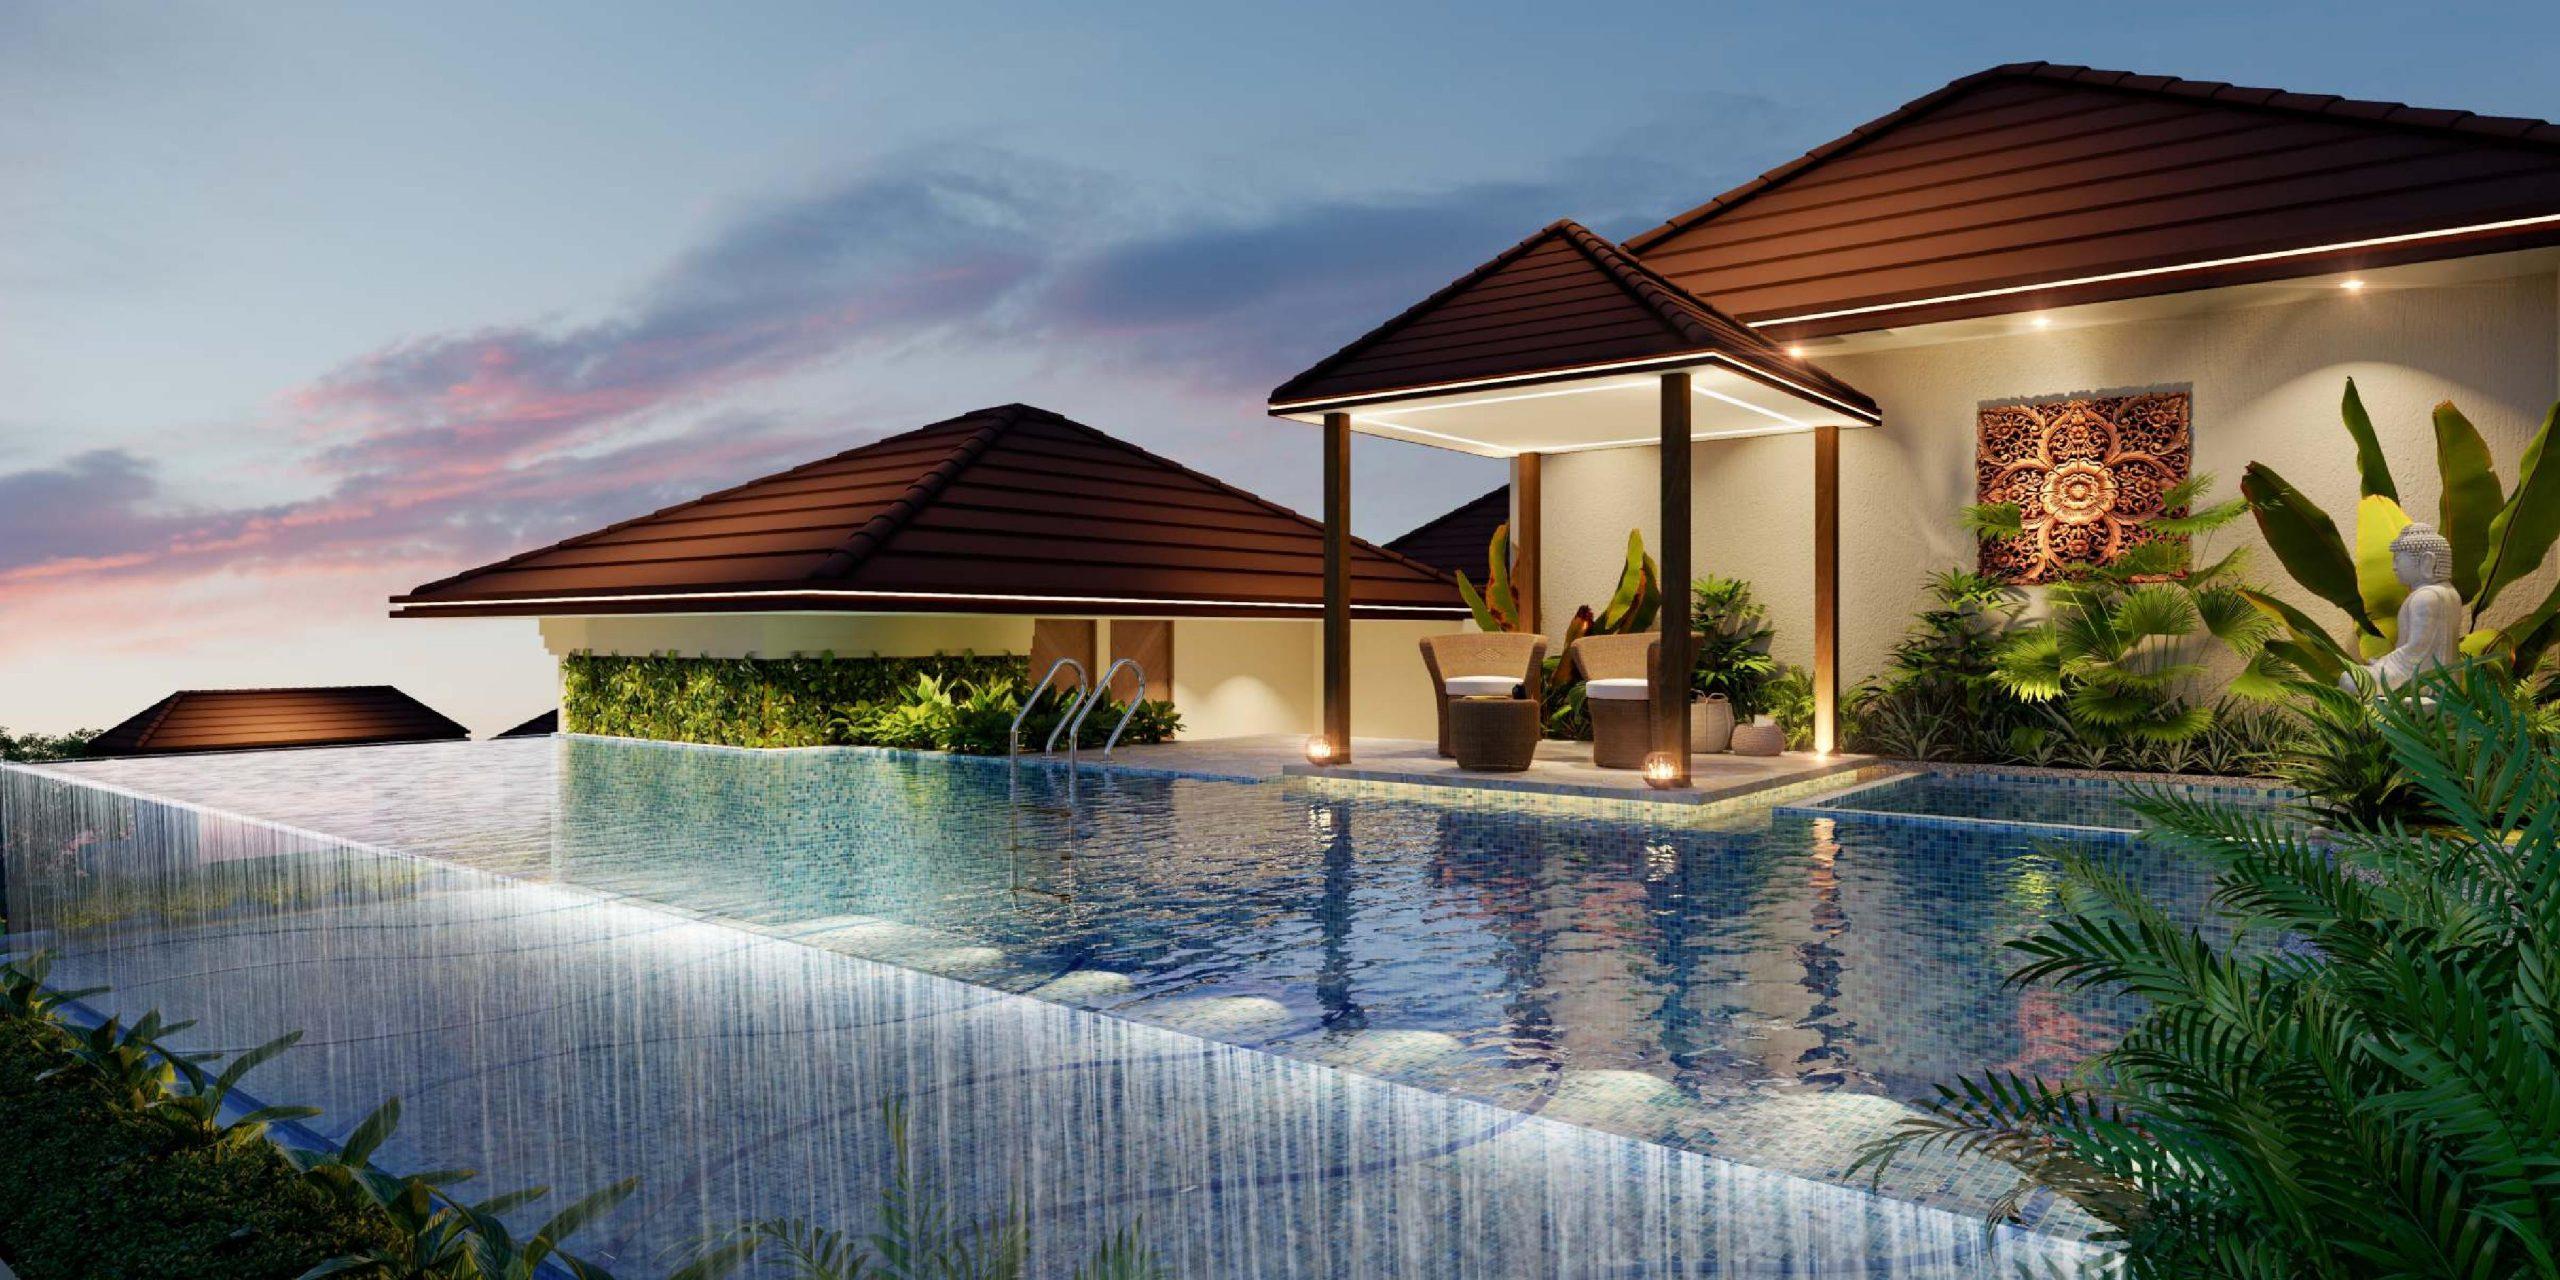 casagrand-florella-villas-in-sarjapur-bangalore-header-image-budget-villas-in-bangalore-gallery-images-1